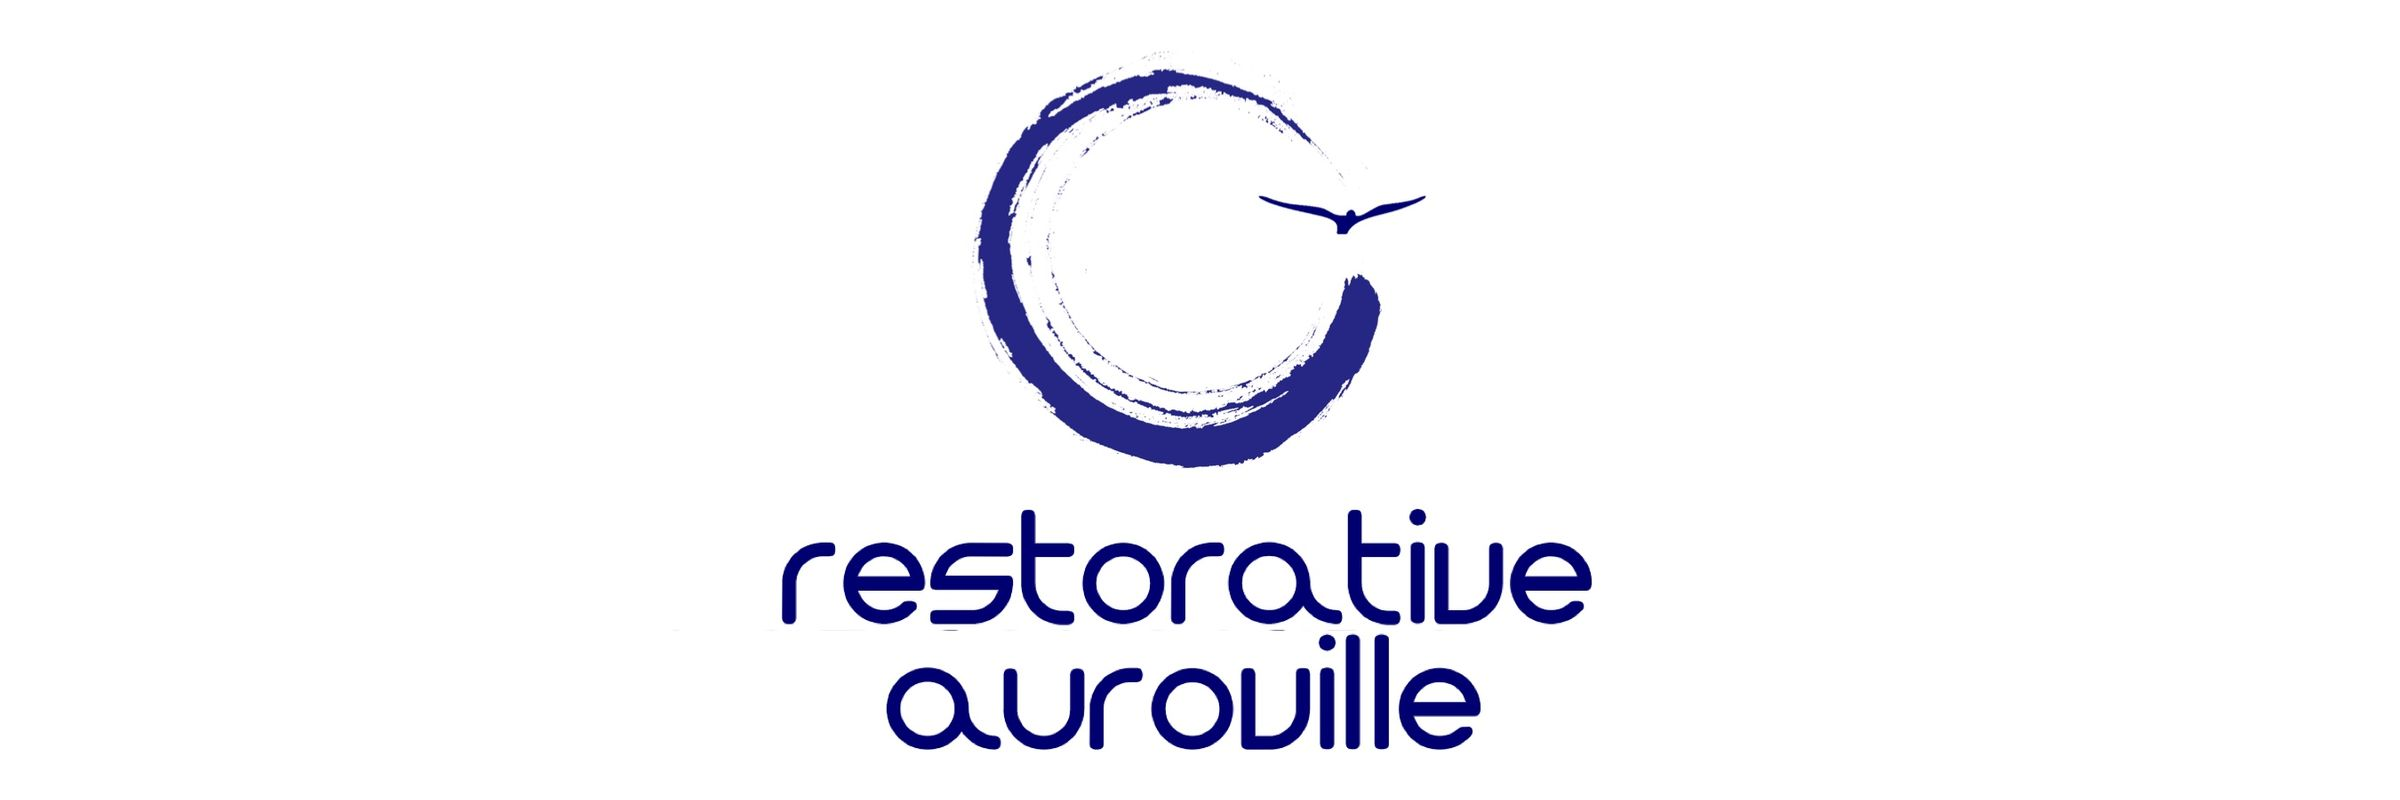 Restorative Auroville